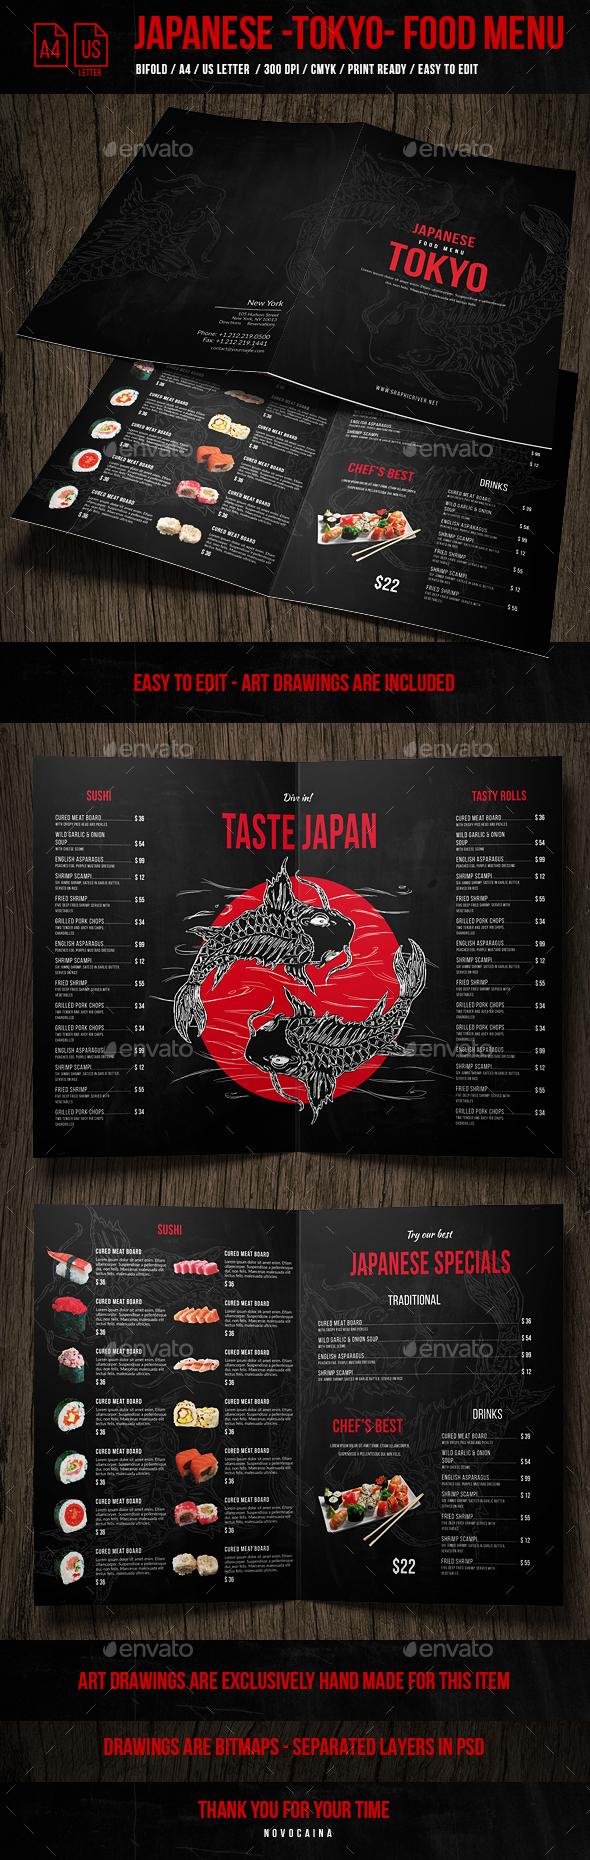 Japanese Bifold A4 & US Letter Menu Design - Exclusive - Food Menus Print Templates